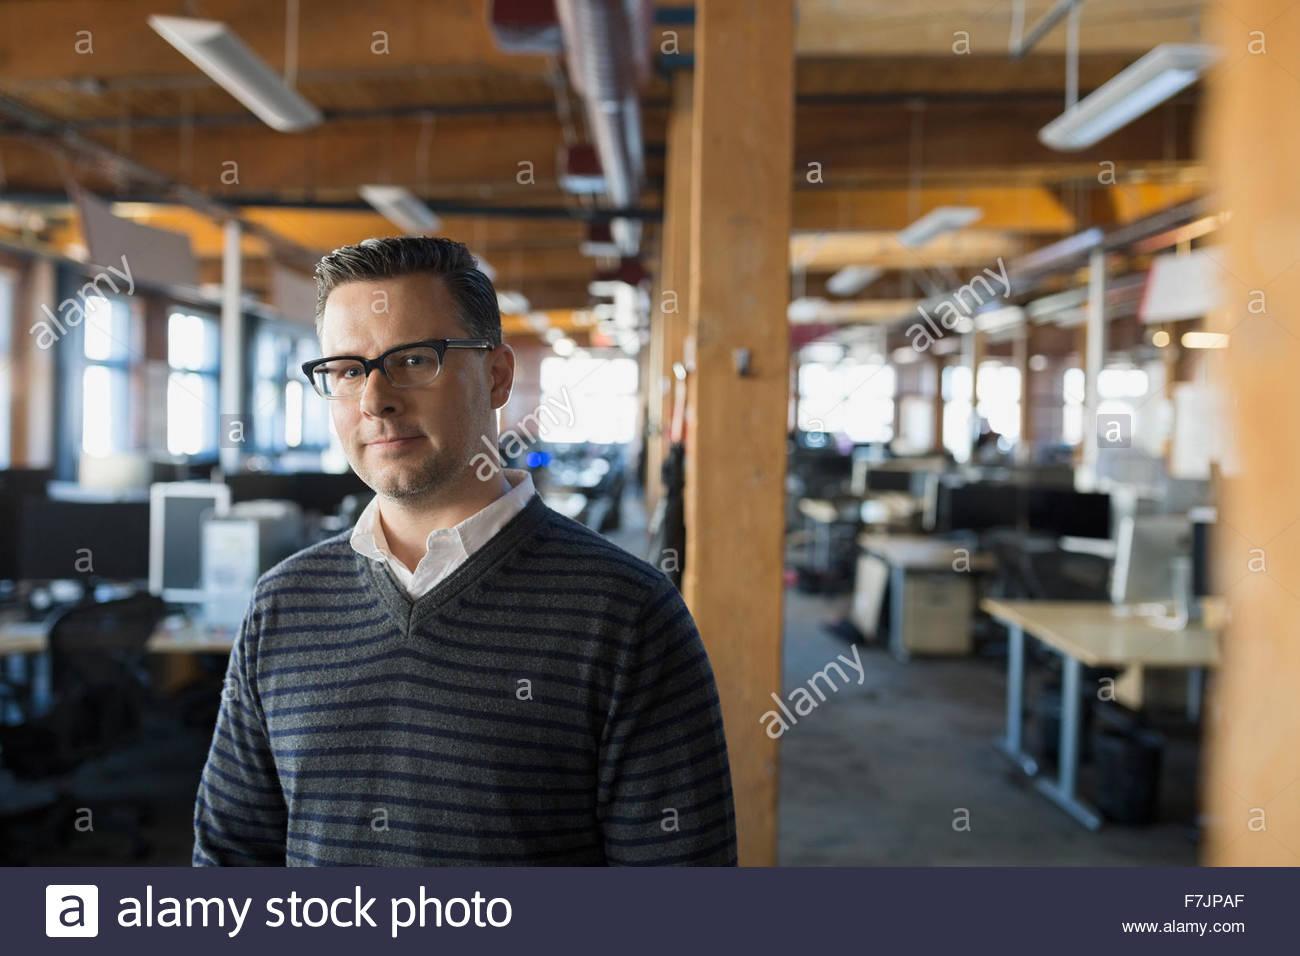 Porträt Ernst Kaufmann im Büro Stockfoto